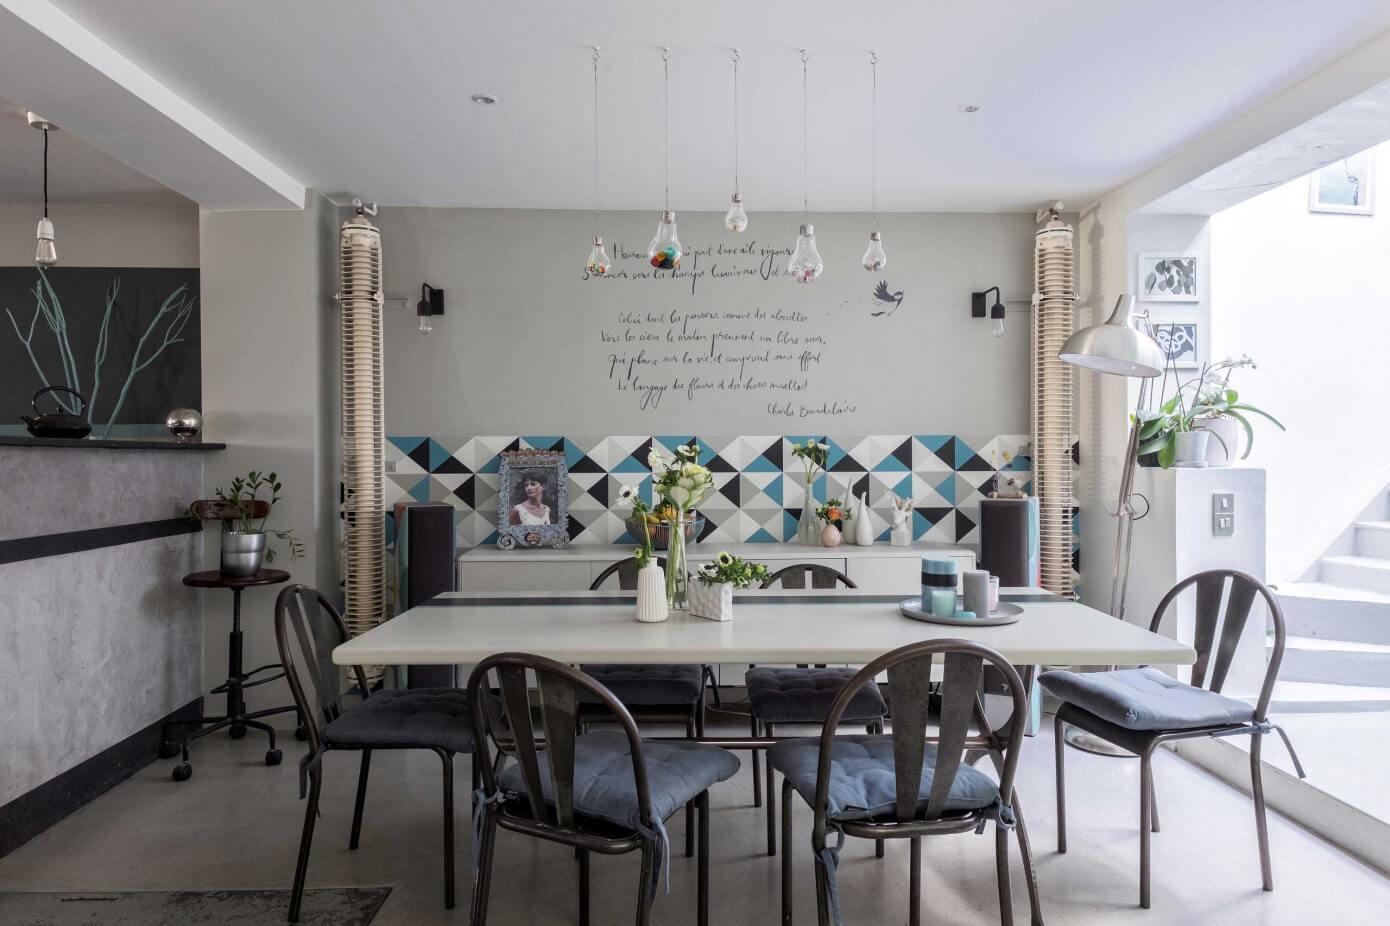 003 loft paris murs merveilles homeadore. Black Bedroom Furniture Sets. Home Design Ideas